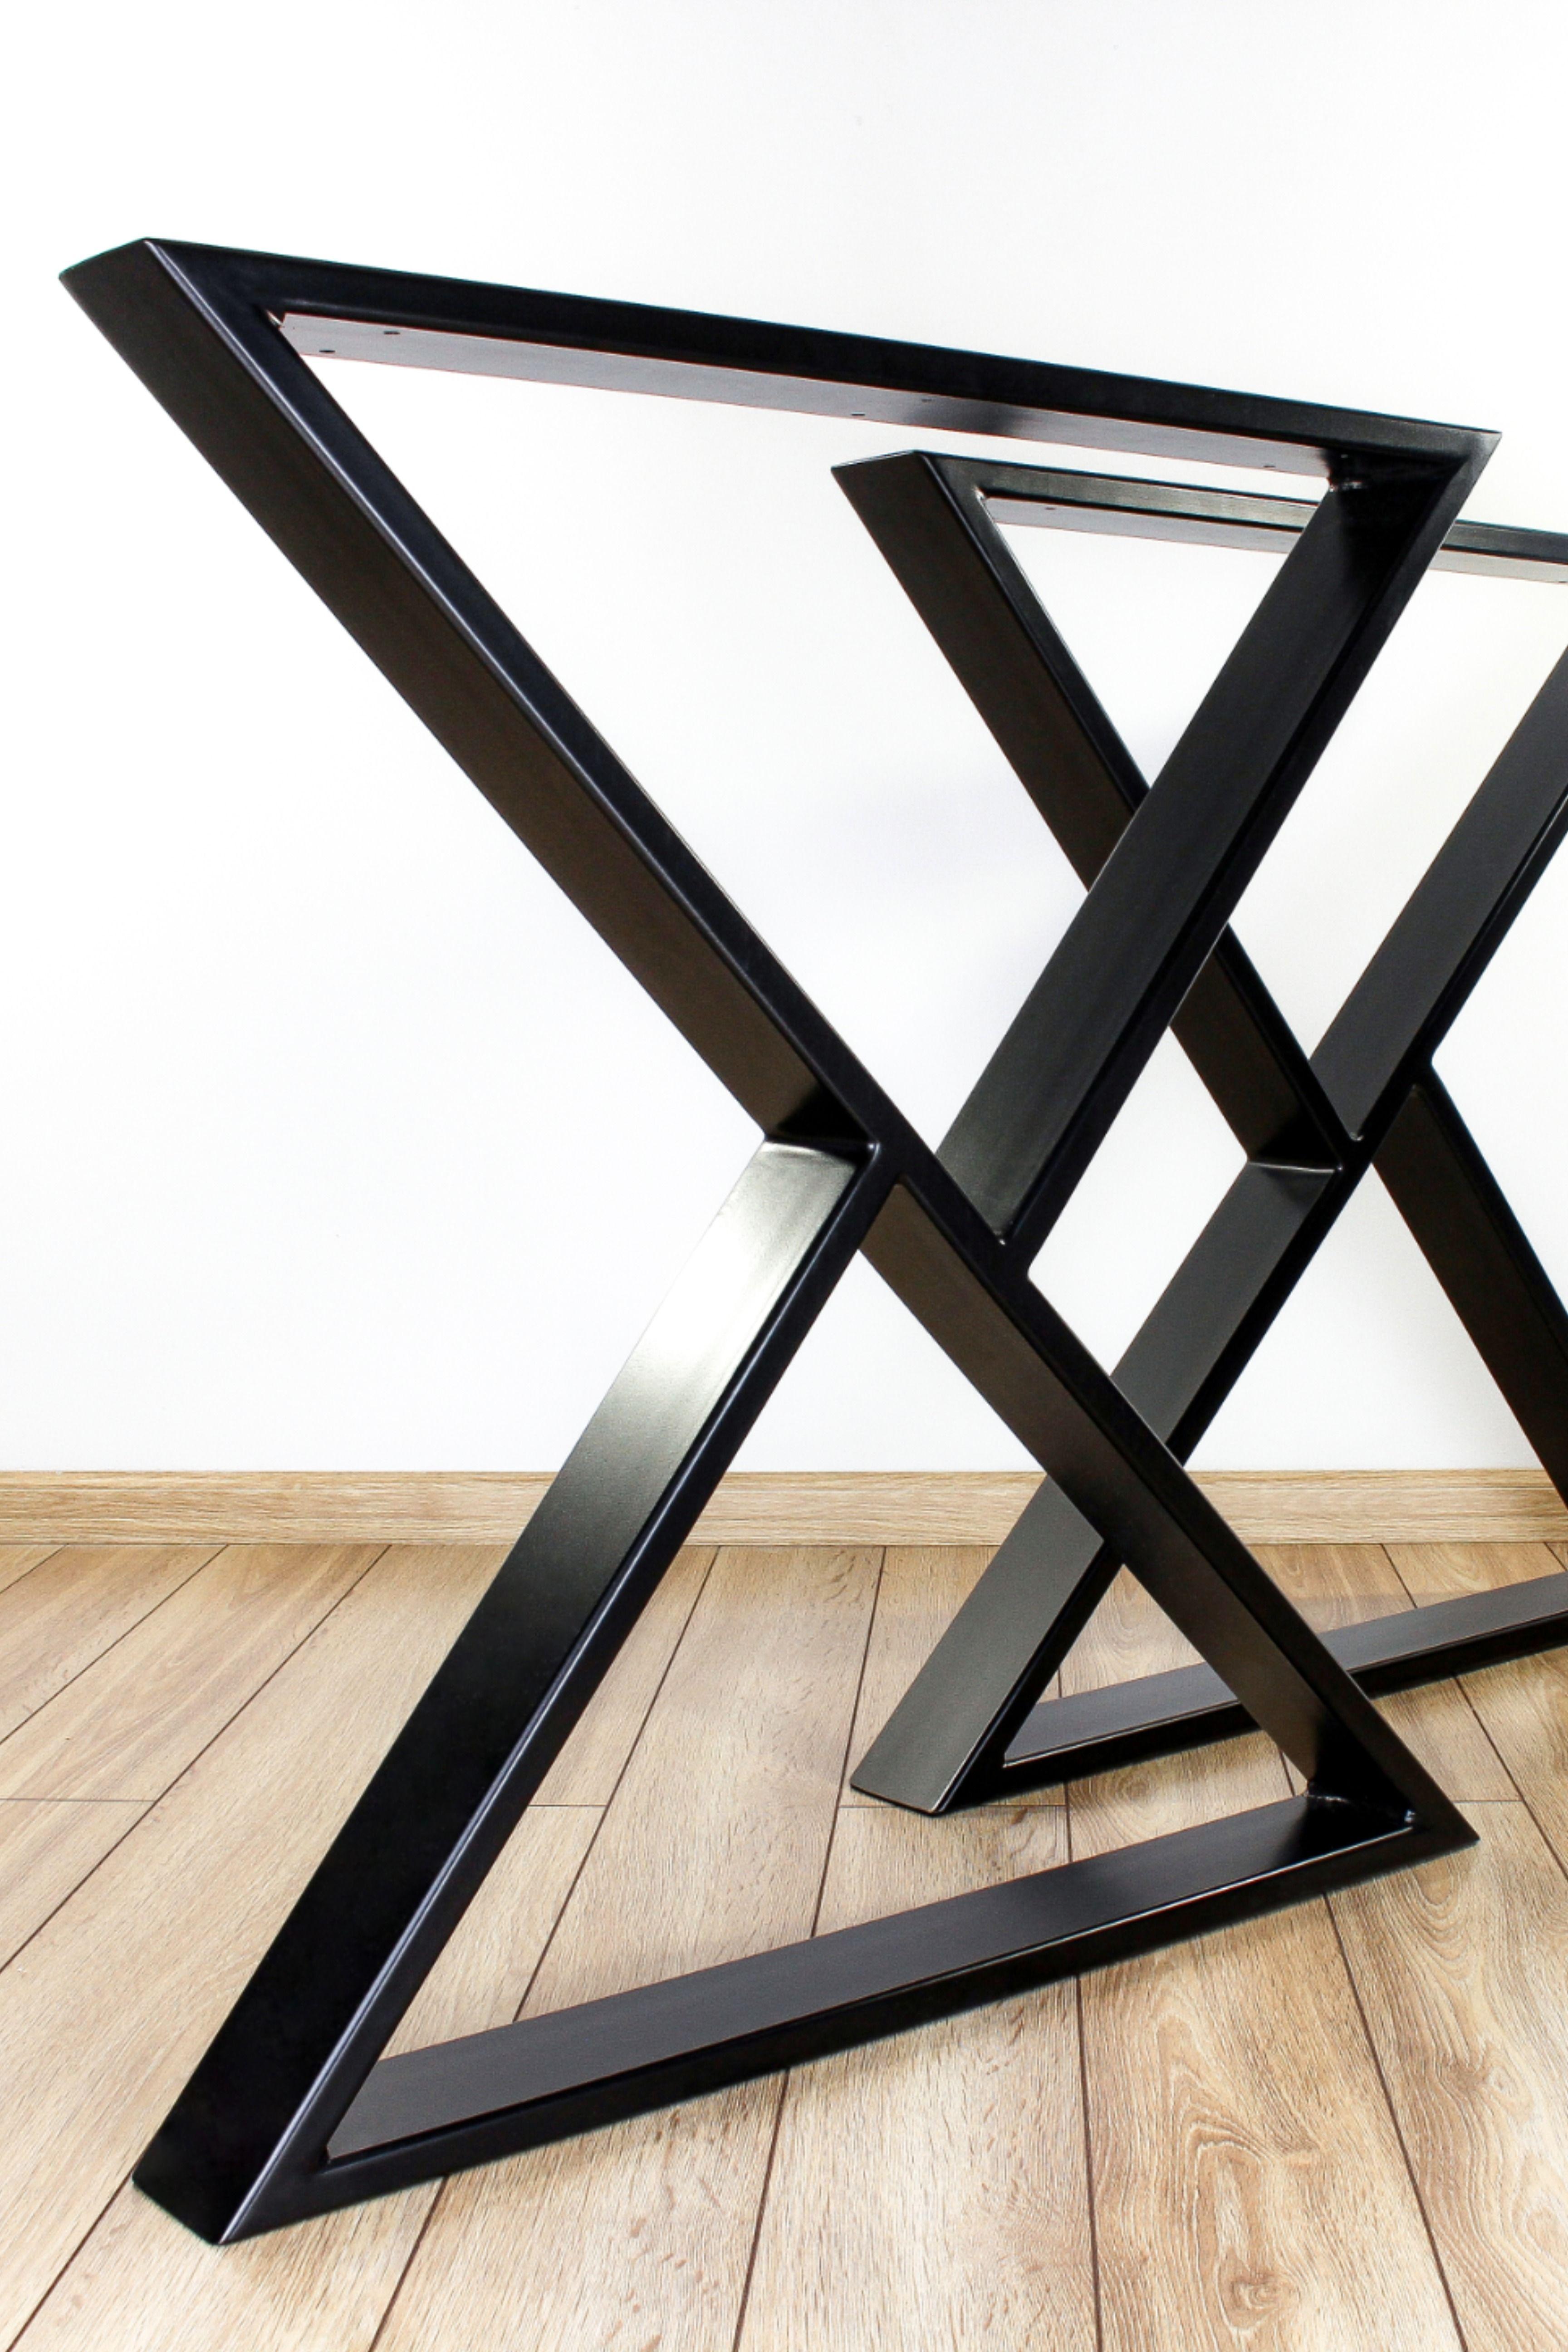 Z Shape Metal Table Legs Iron Table Legs Industrial Style Table Legs Modern Table Legs Z Legs Steel Table Legs Metal Table Modern Table Legs [ 5184 x 3456 Pixel ]